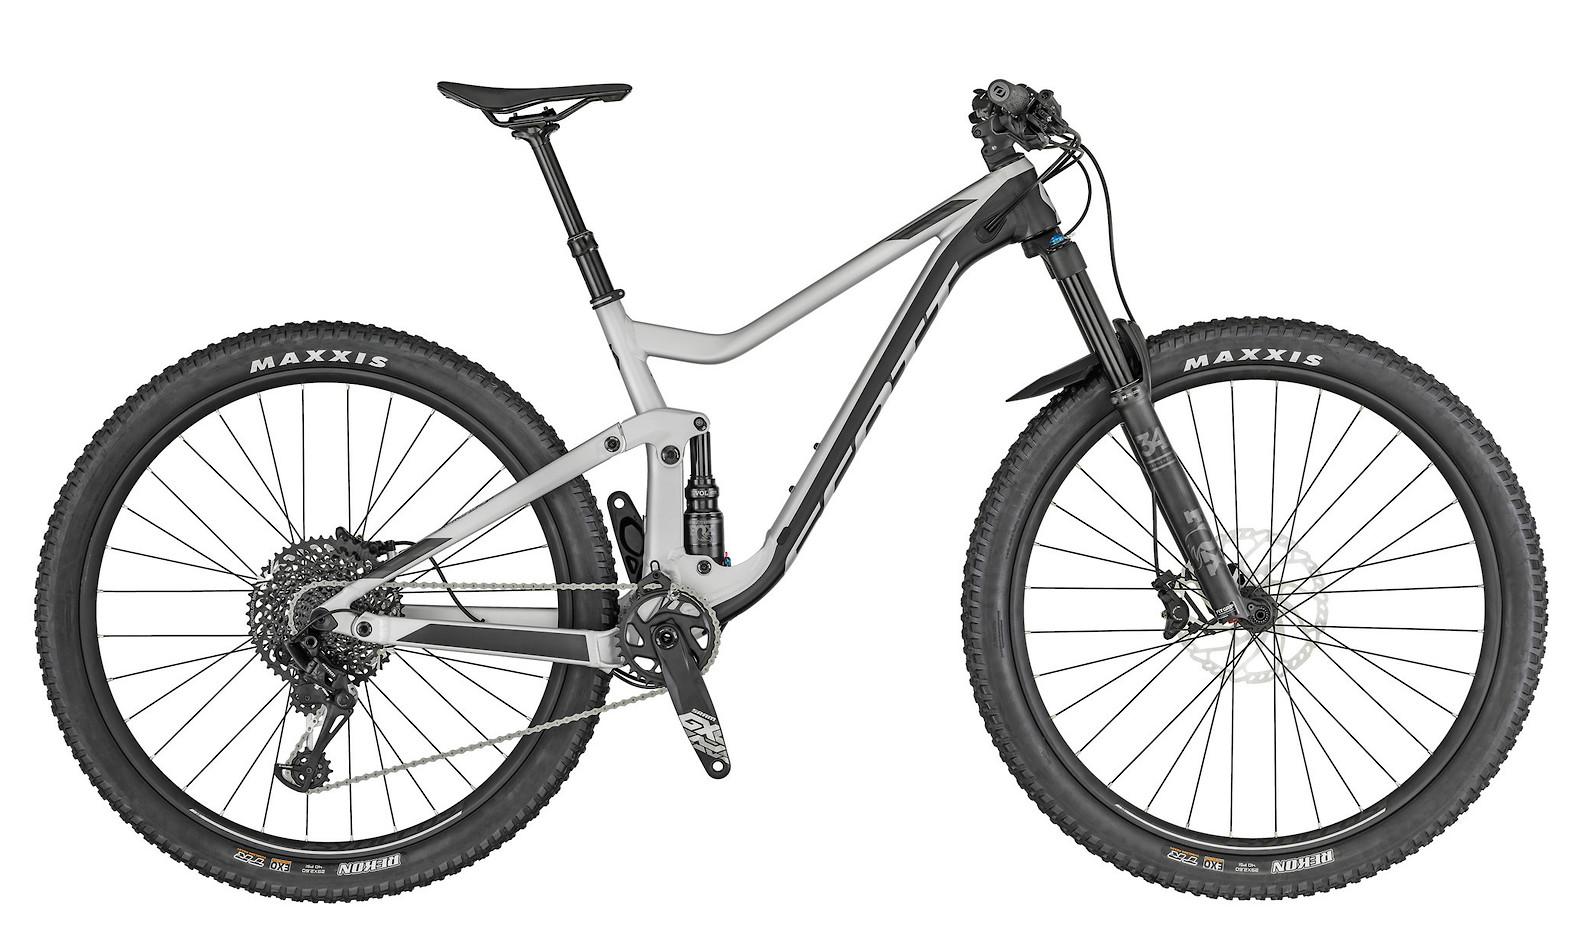 2019 Scott Genius 940 Bike